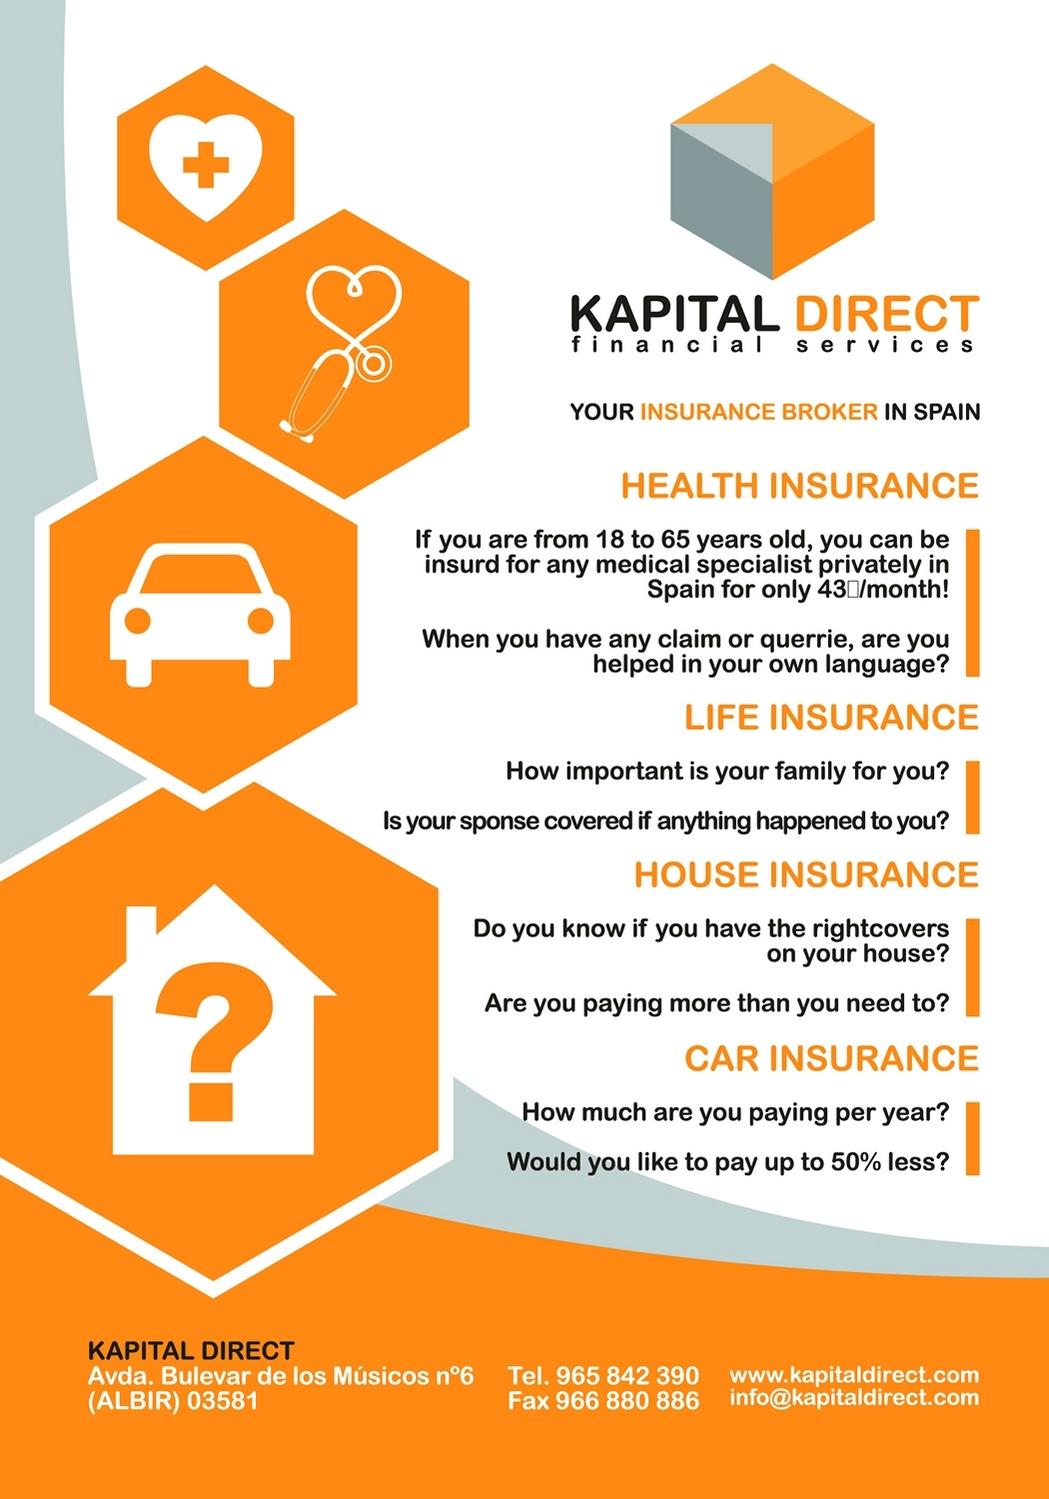 Kapital Direct